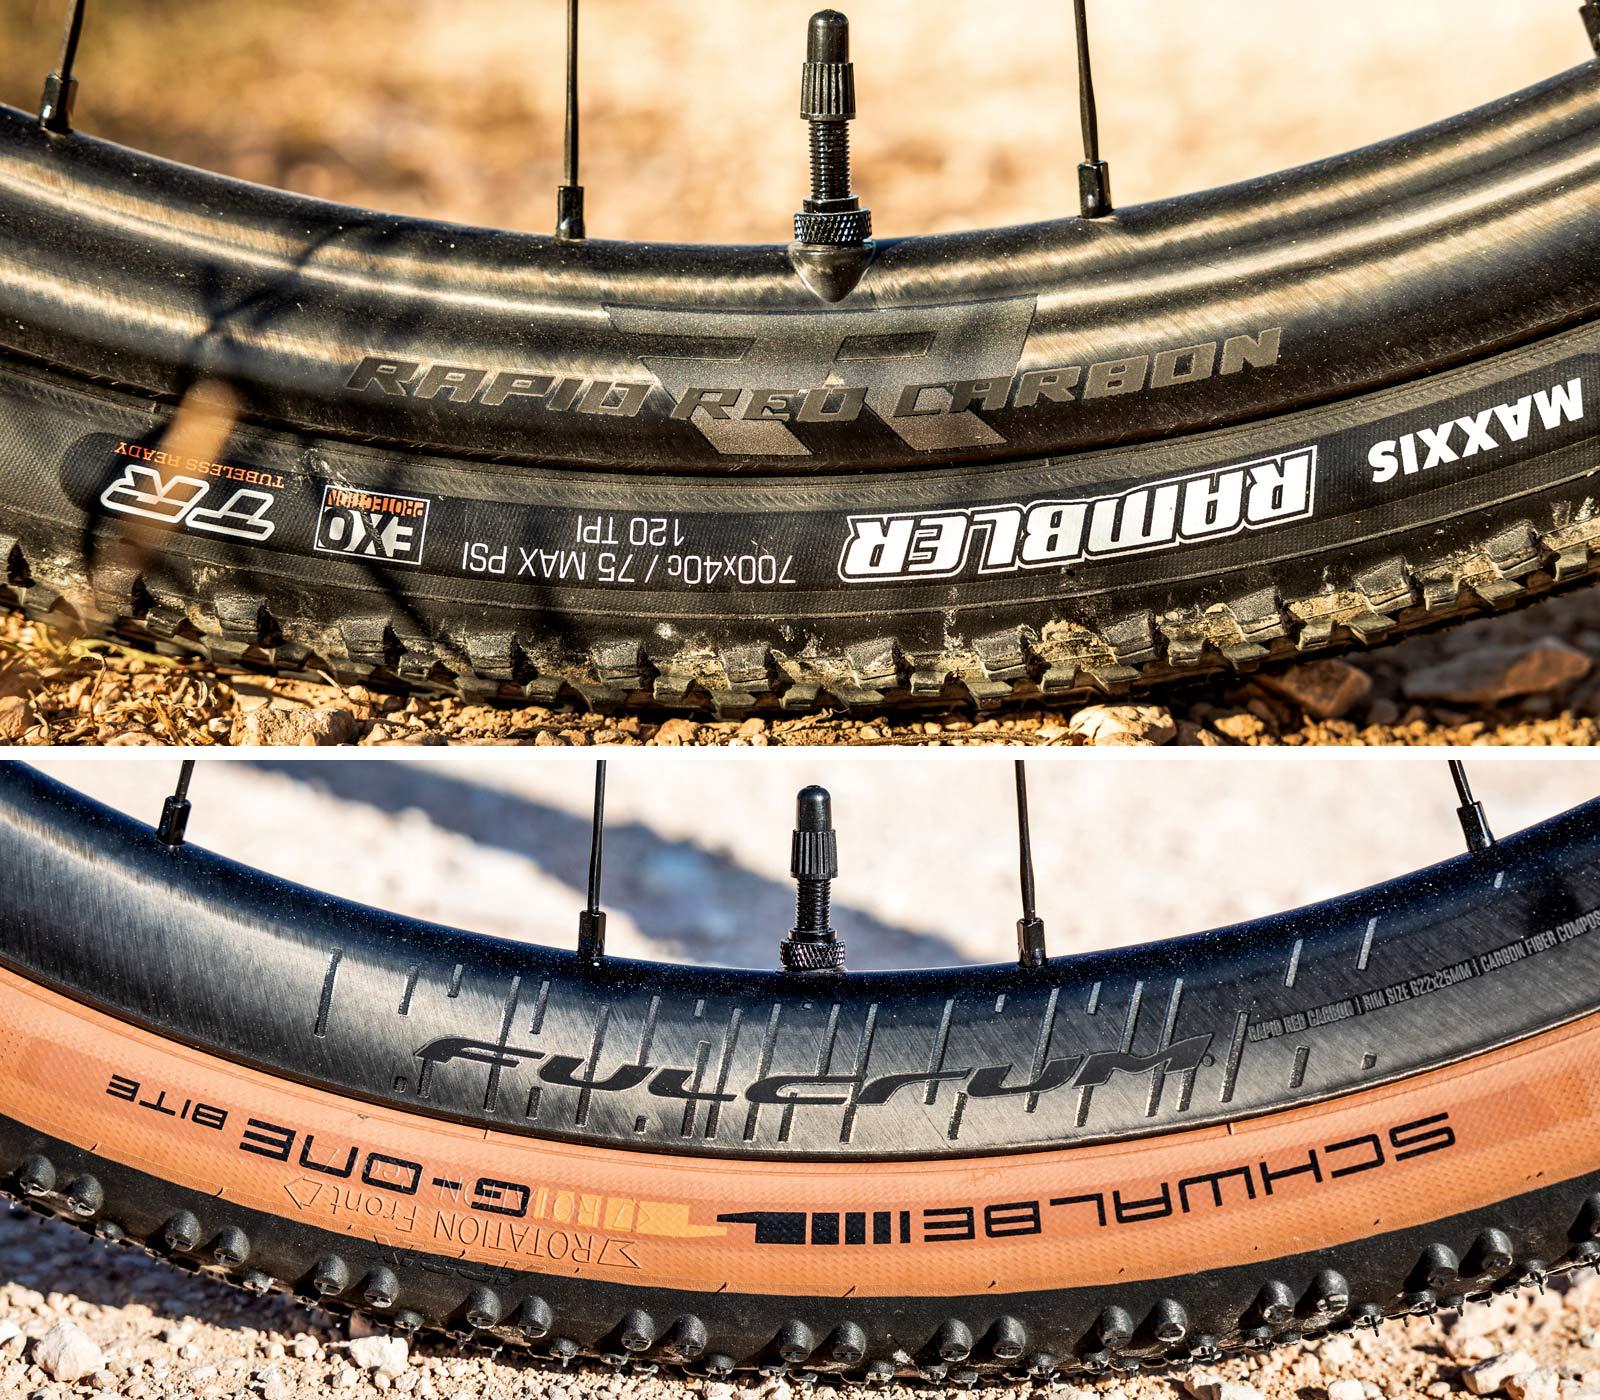 Fulcrum Rapid Red Carbon lightweight asymmetric tubeless gravel bike wheels,asymmetric rim details